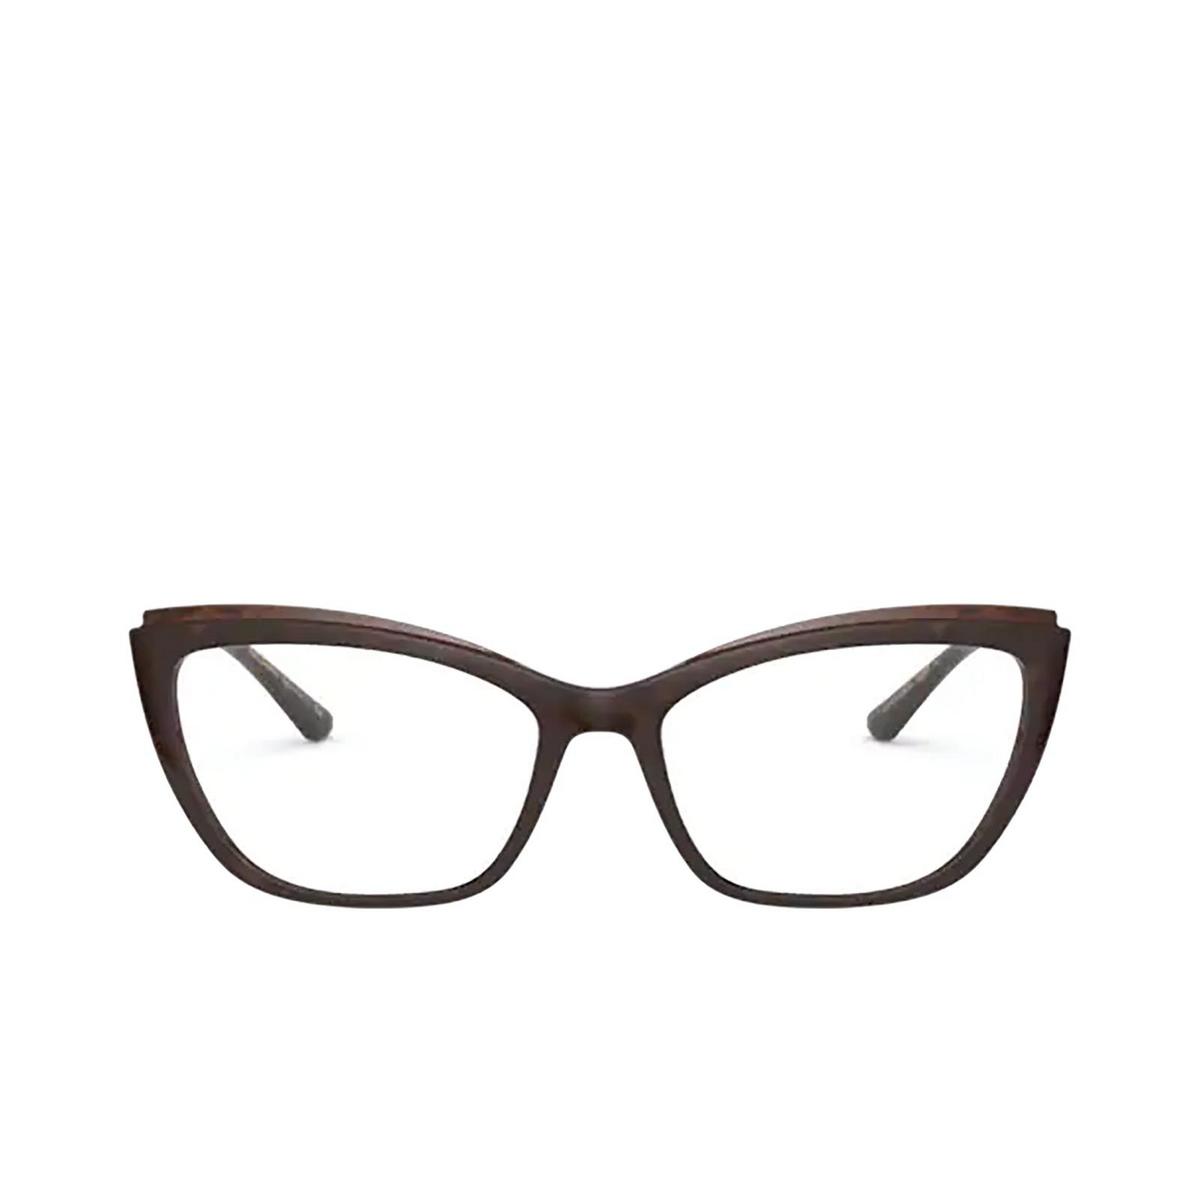 Dolce & Gabbana® Cat-eye Eyeglasses: DG5054 color Havana On Transparent Brown 3185 - front view.